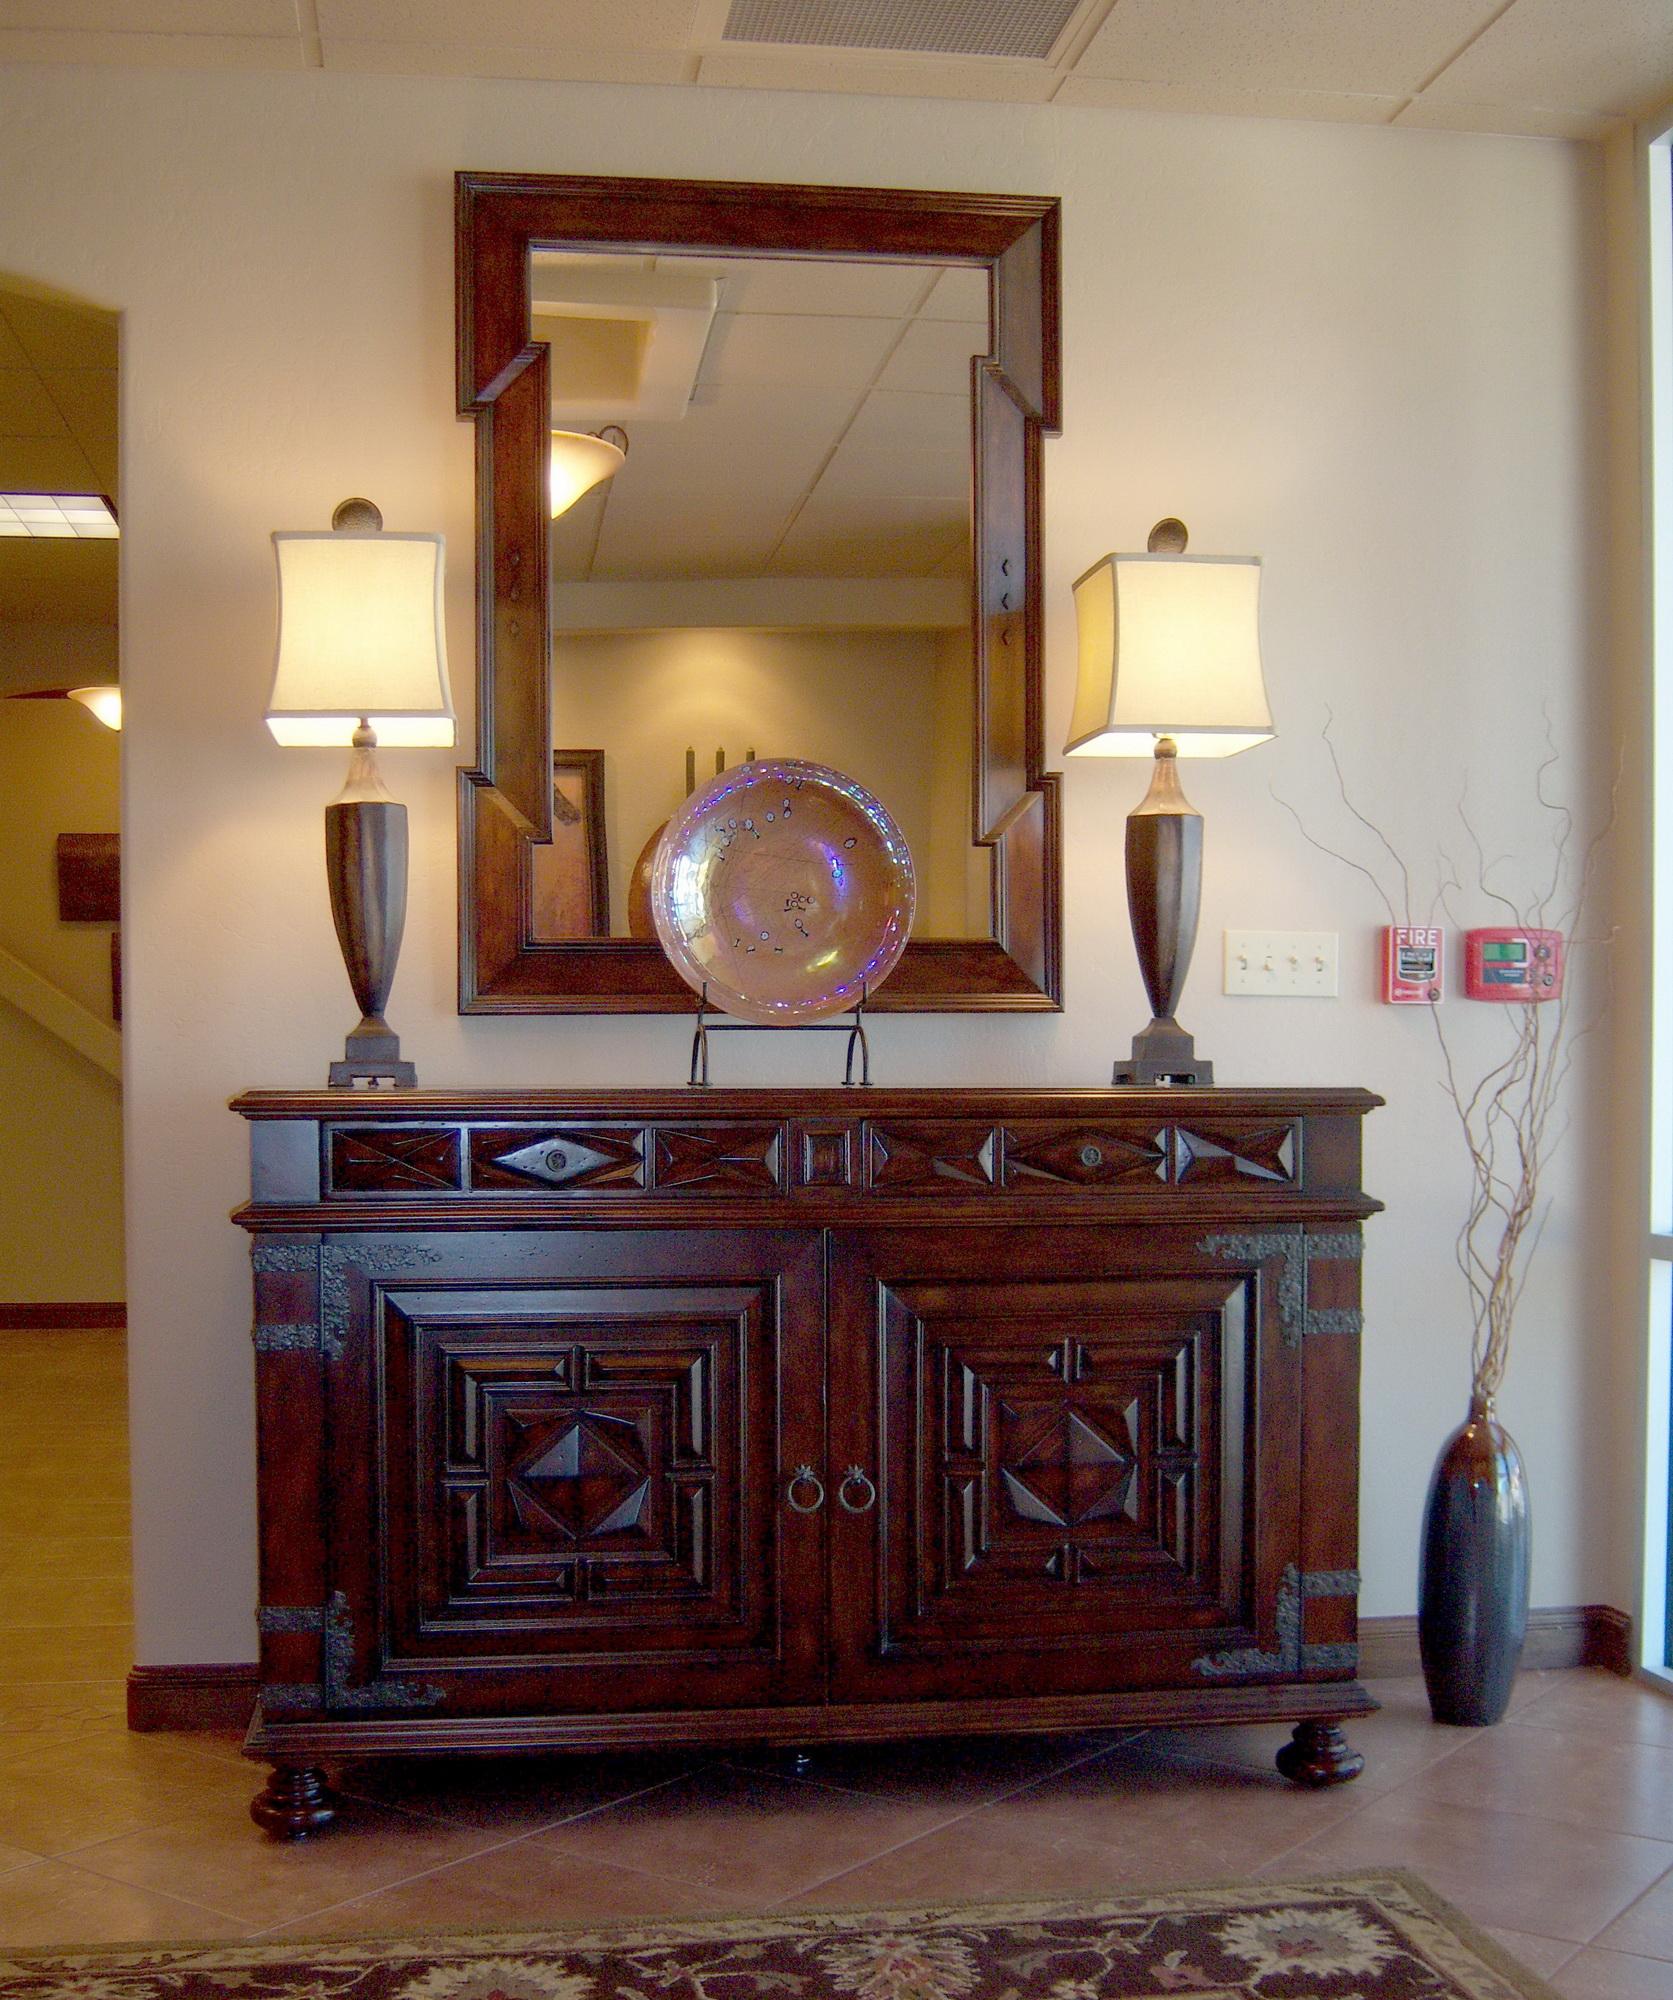 Used Furniture Stores Santa Fe Nm Sedona Slatback Side Chair American Home Furniture Store